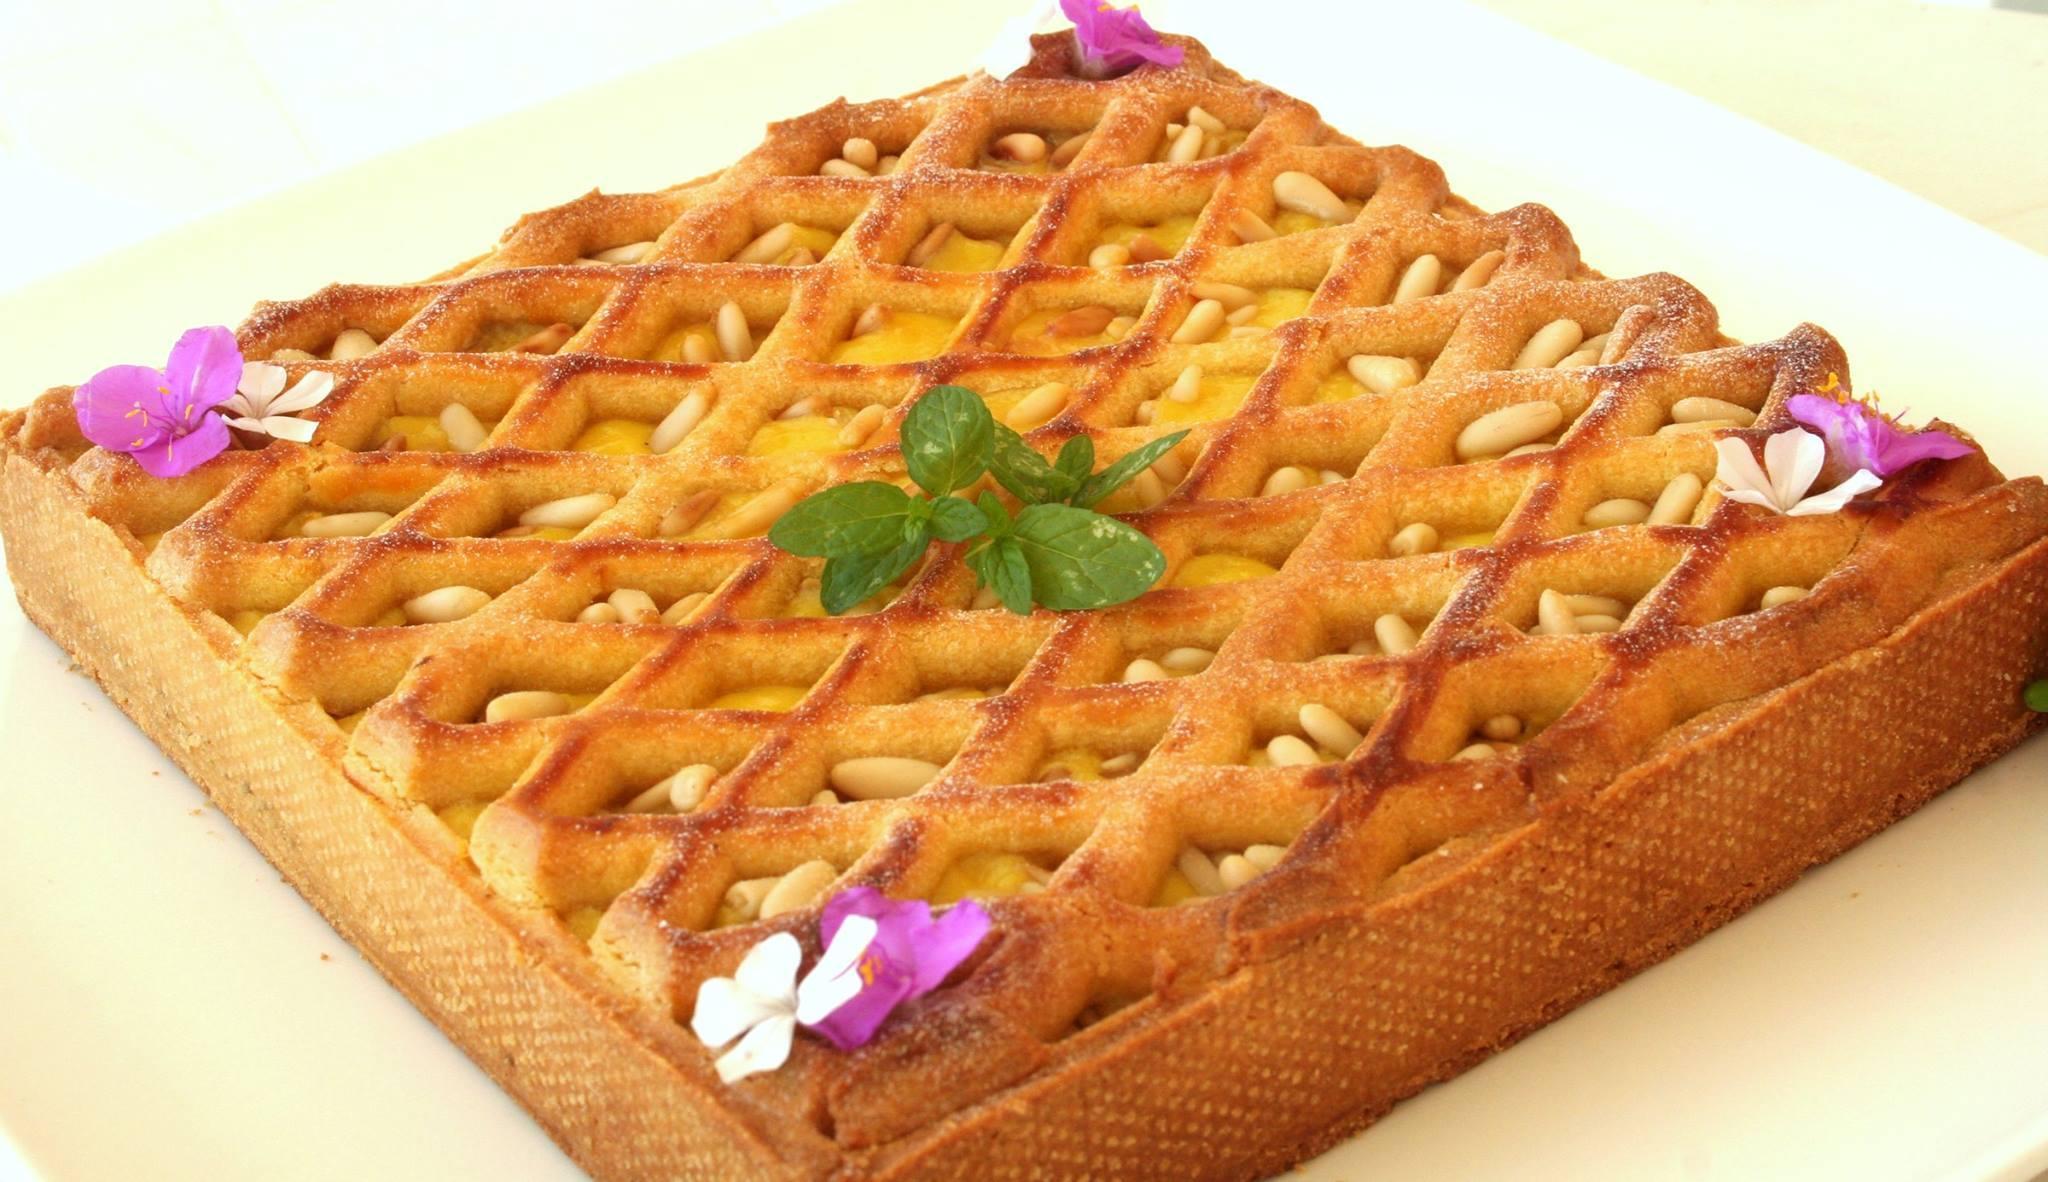 Torta della Nonna innovativa ispirata a Massari e Montersino